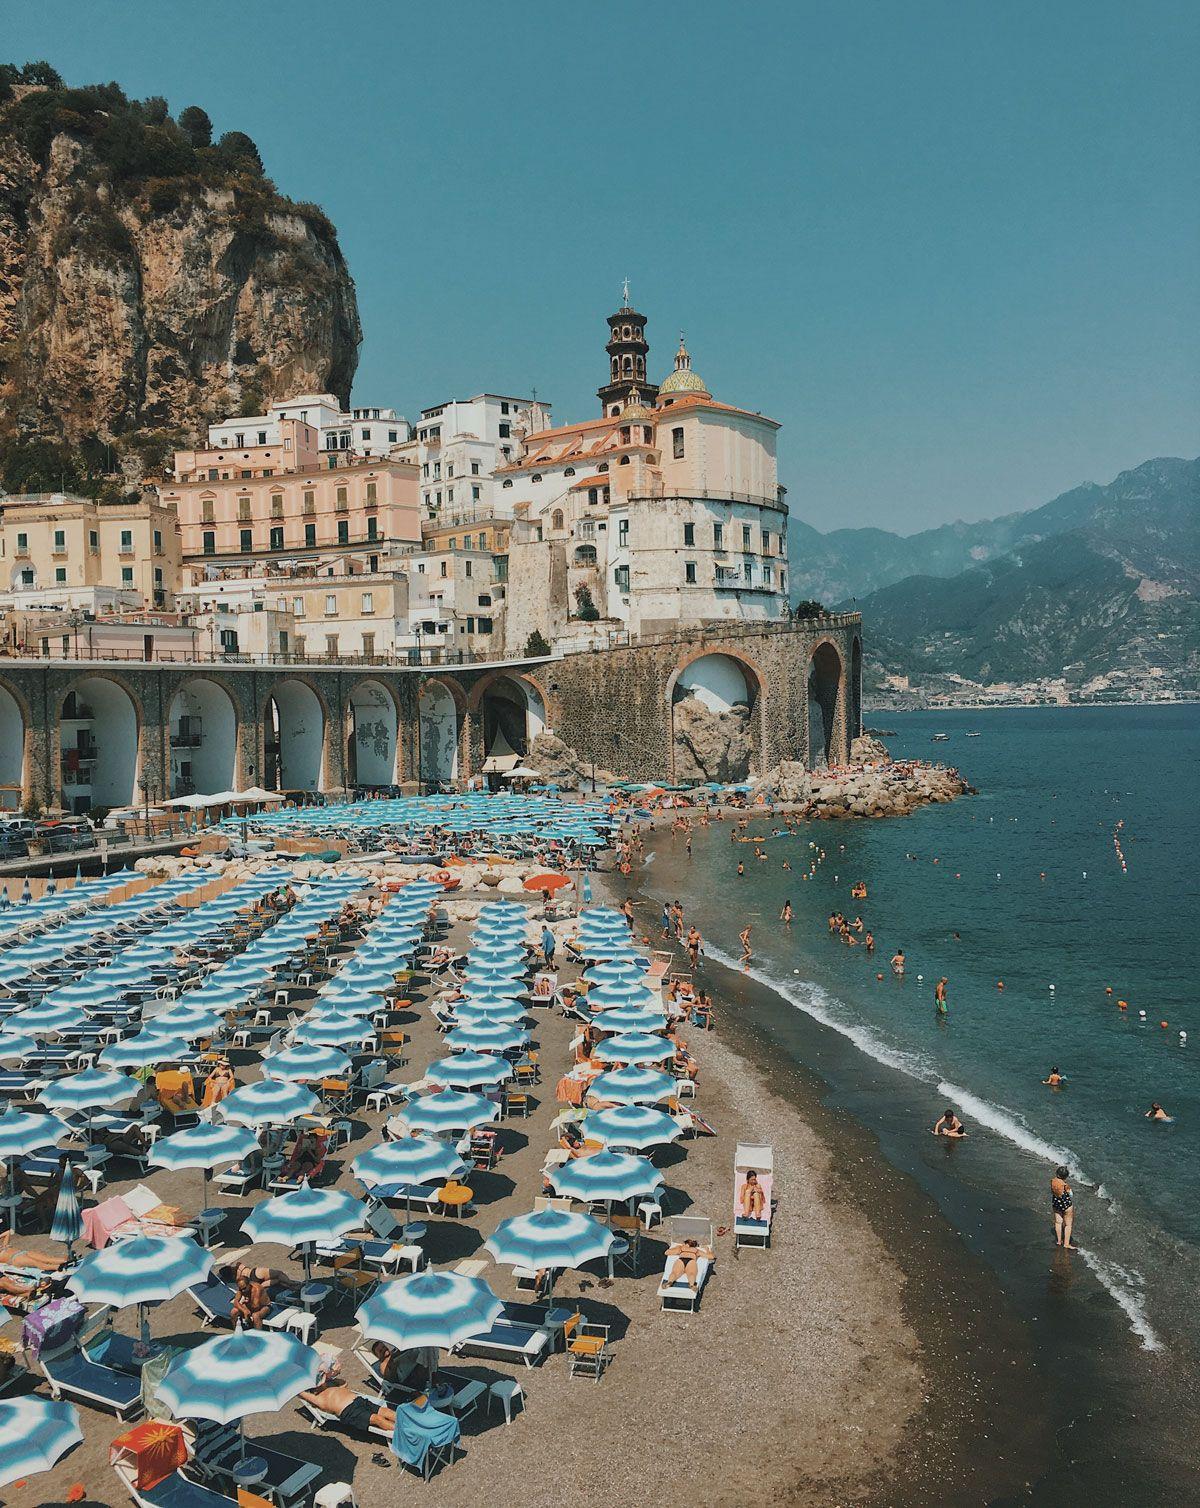 Amalfi Coast Beaches For Your Next Vacation Travel Luxury Luxury Beach Vacation Amalfi Coast Beaches Beach Vacation Tips